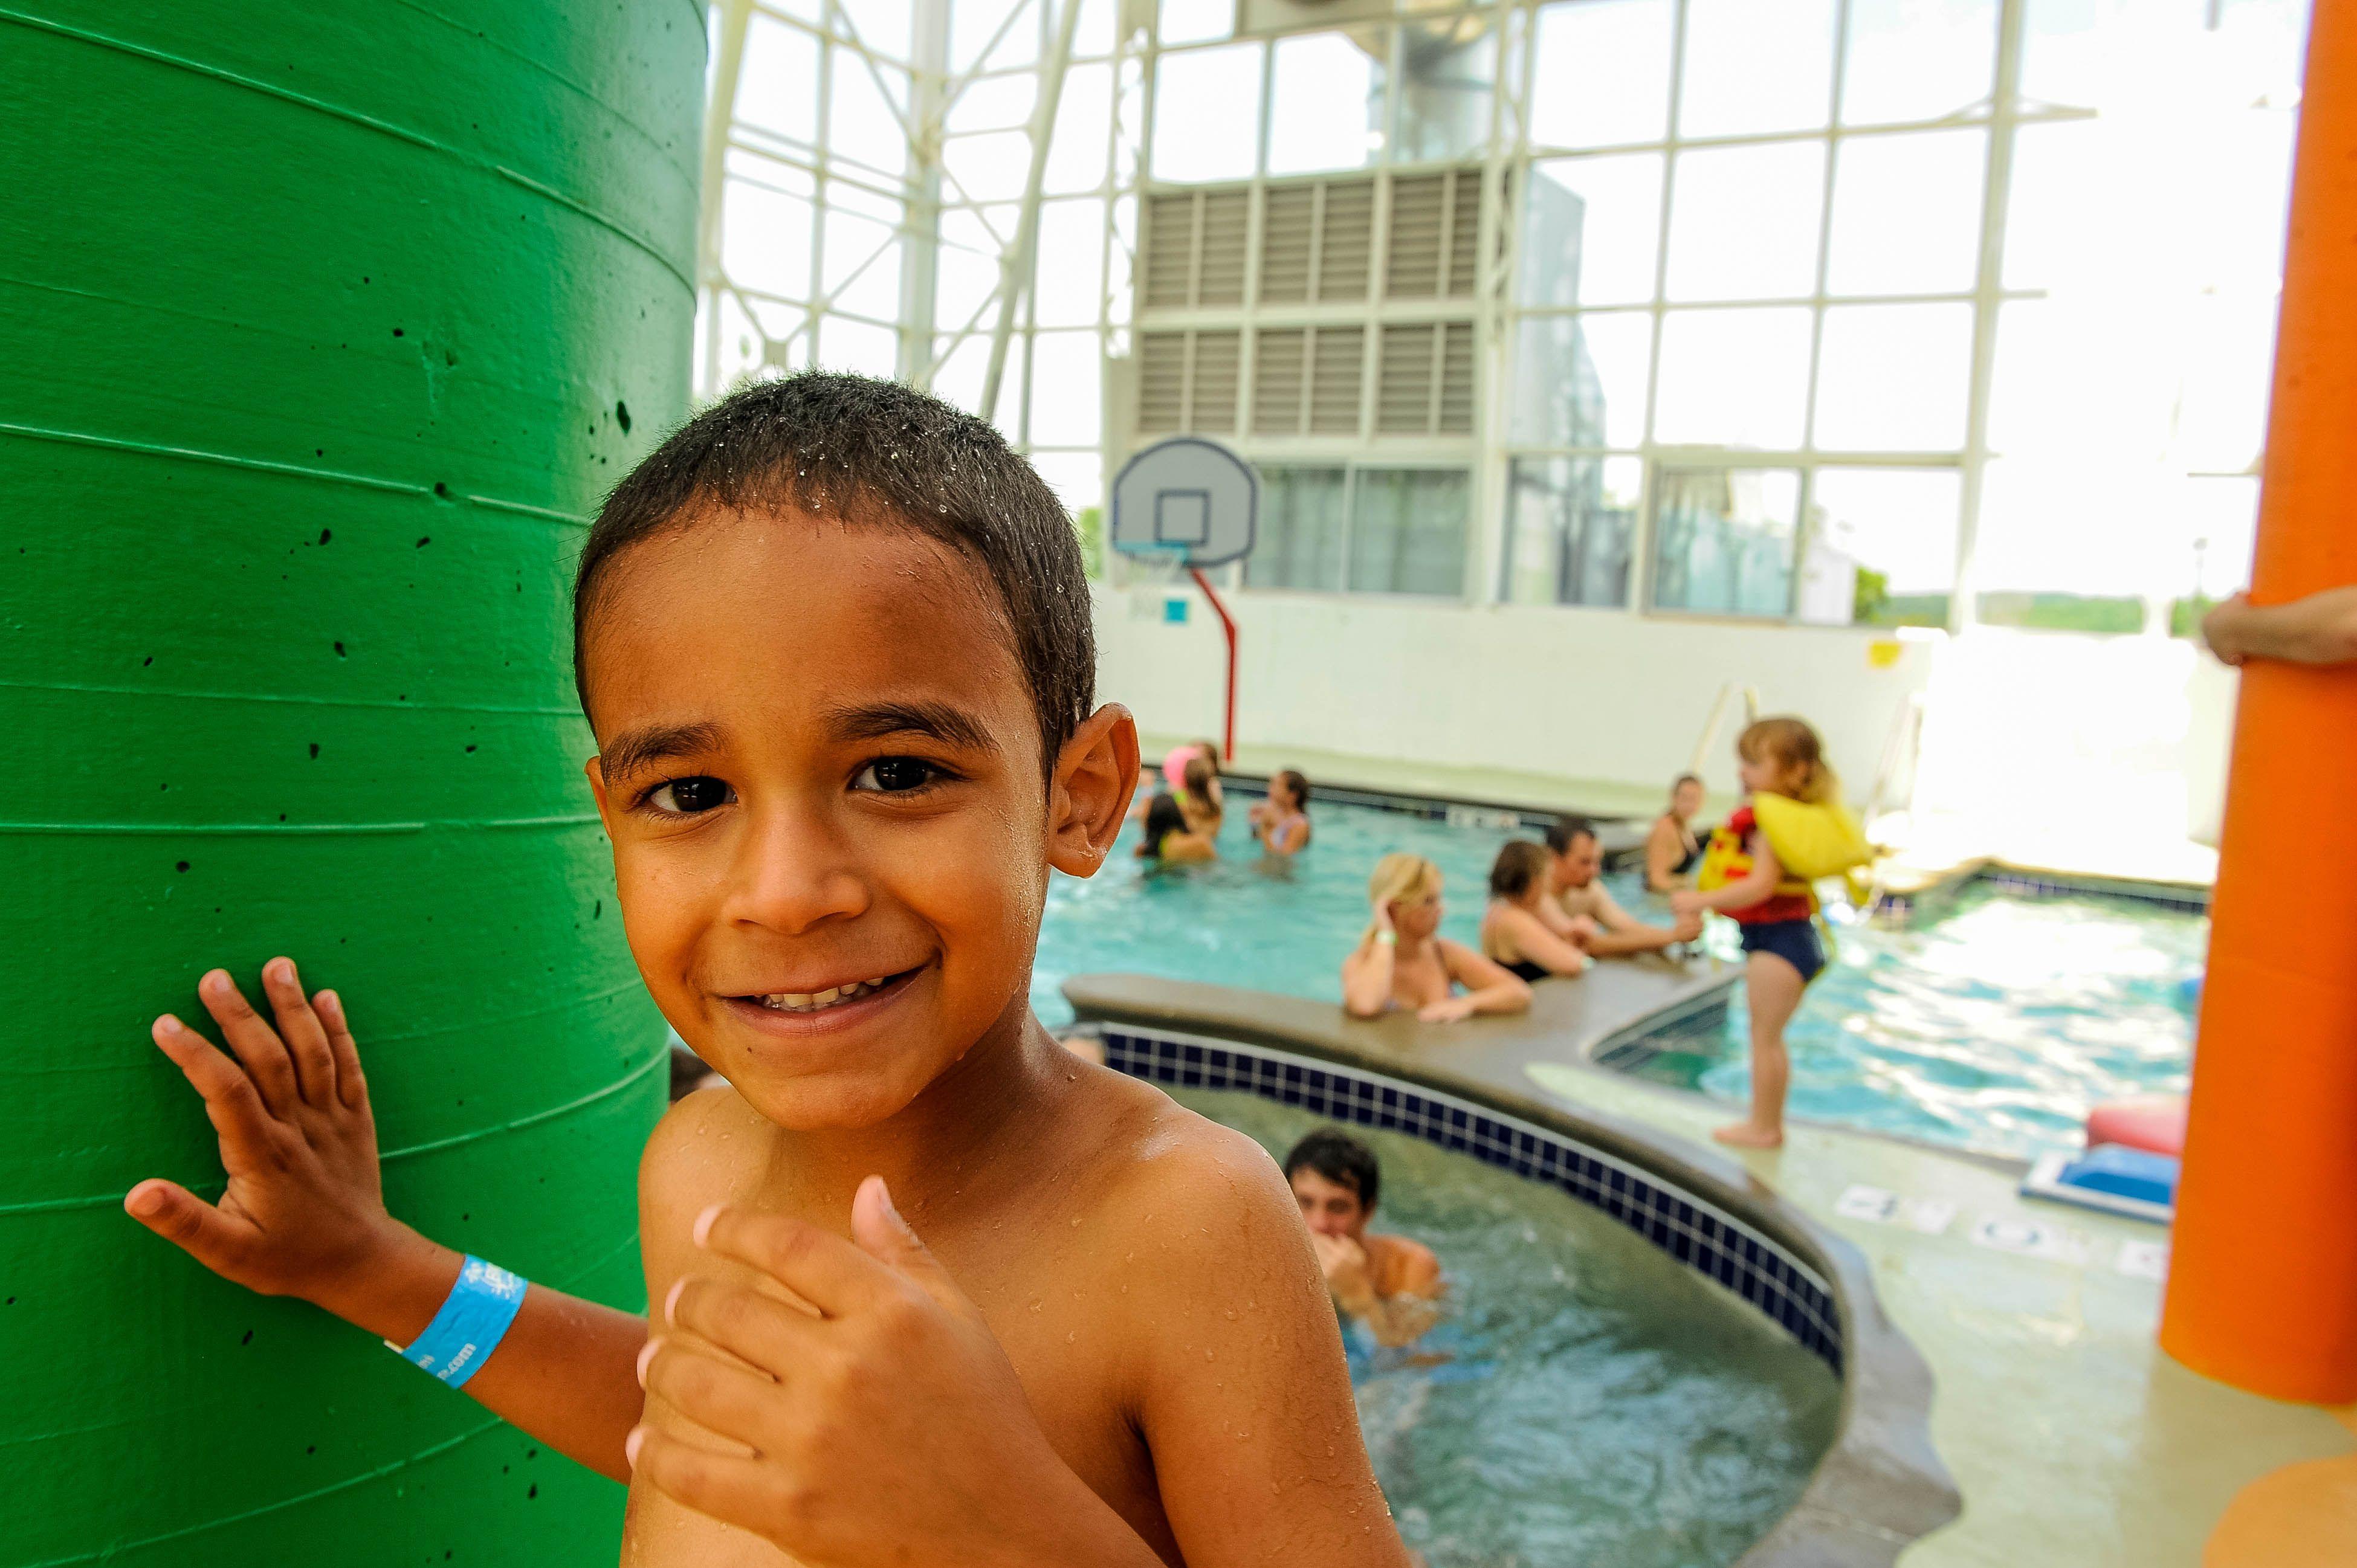 Big Splash Adventure Indoor Water Park And Hotel Is The Perfect Family Getaway Waterpark Indiana Tr Indoor Waterpark Indoor Water Park Resorts Park Resorts